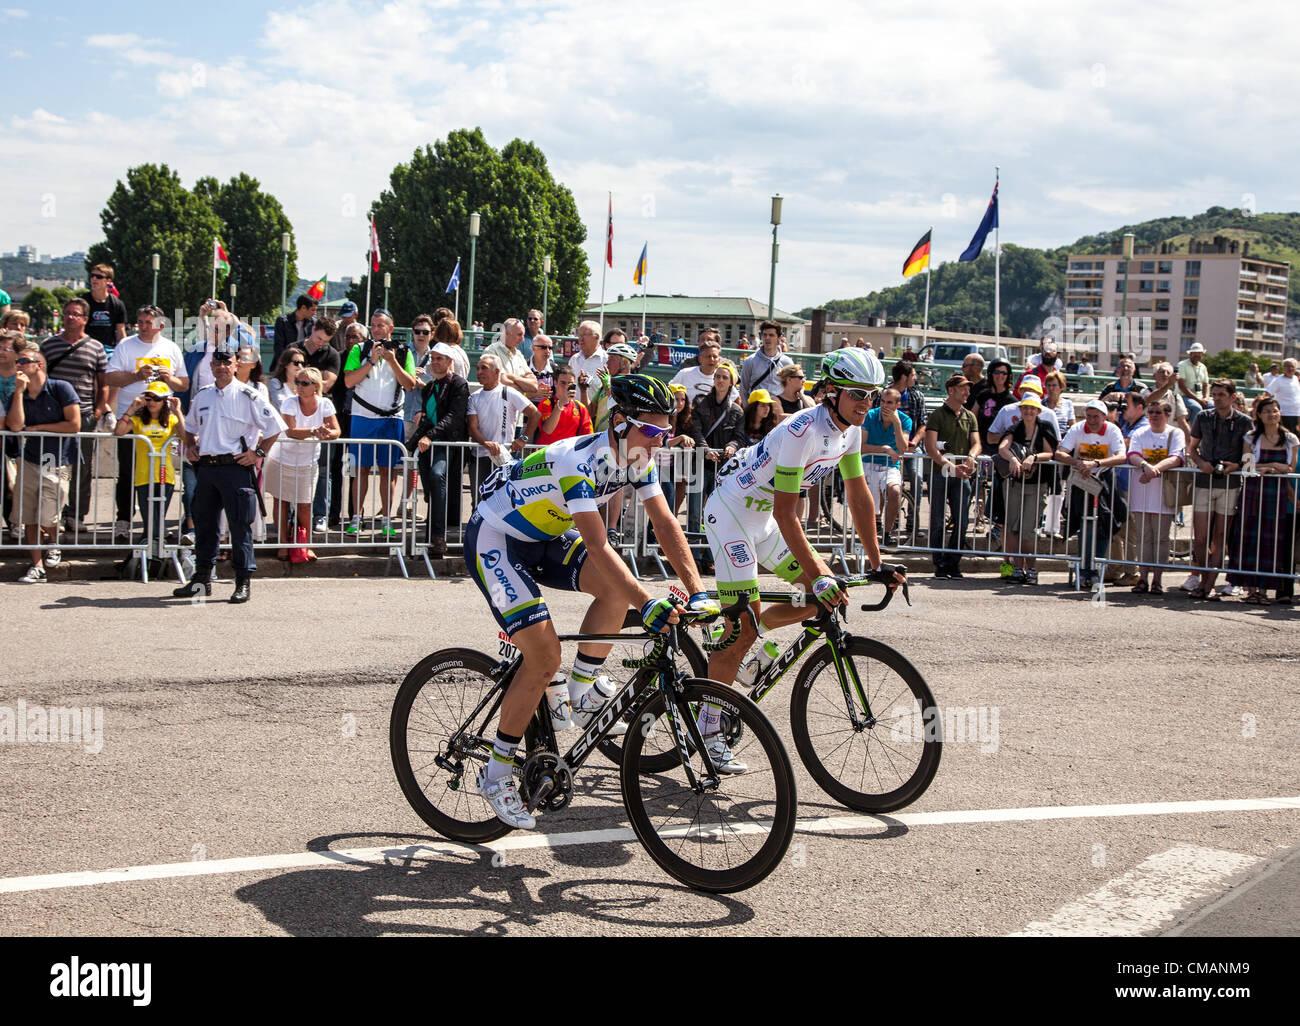 Dutch Cycling Team Stock Photos & Dutch Cycling Team Stock ...